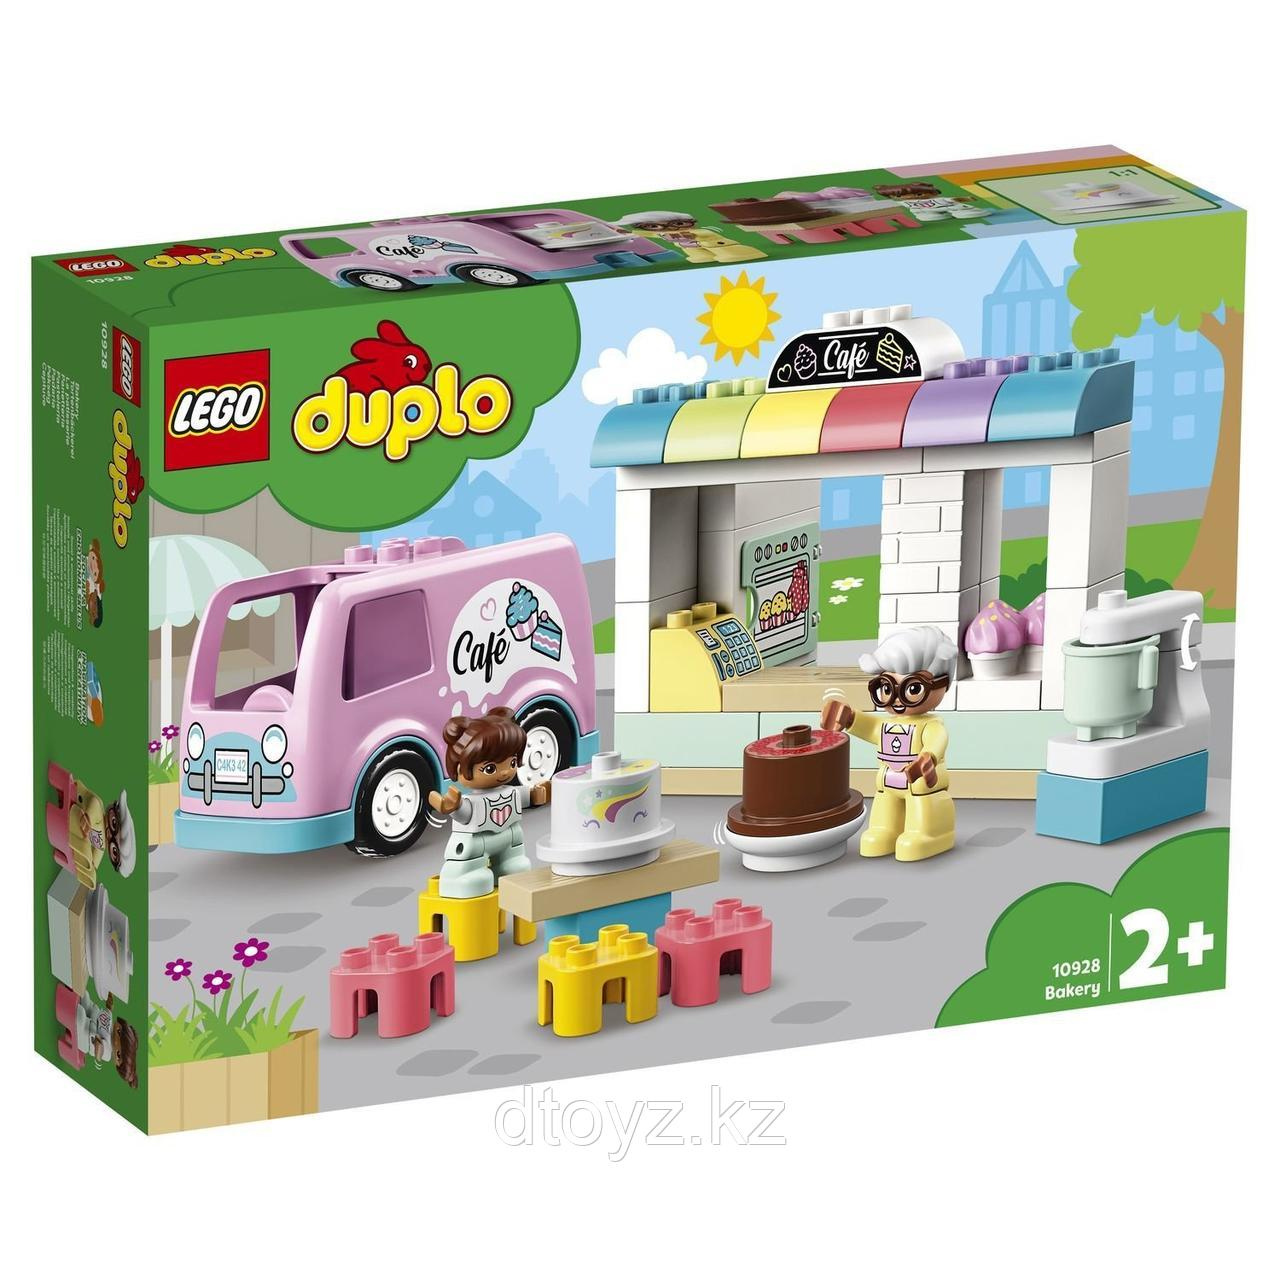 LEGO Duplo Princess Town 10928 Пекарня